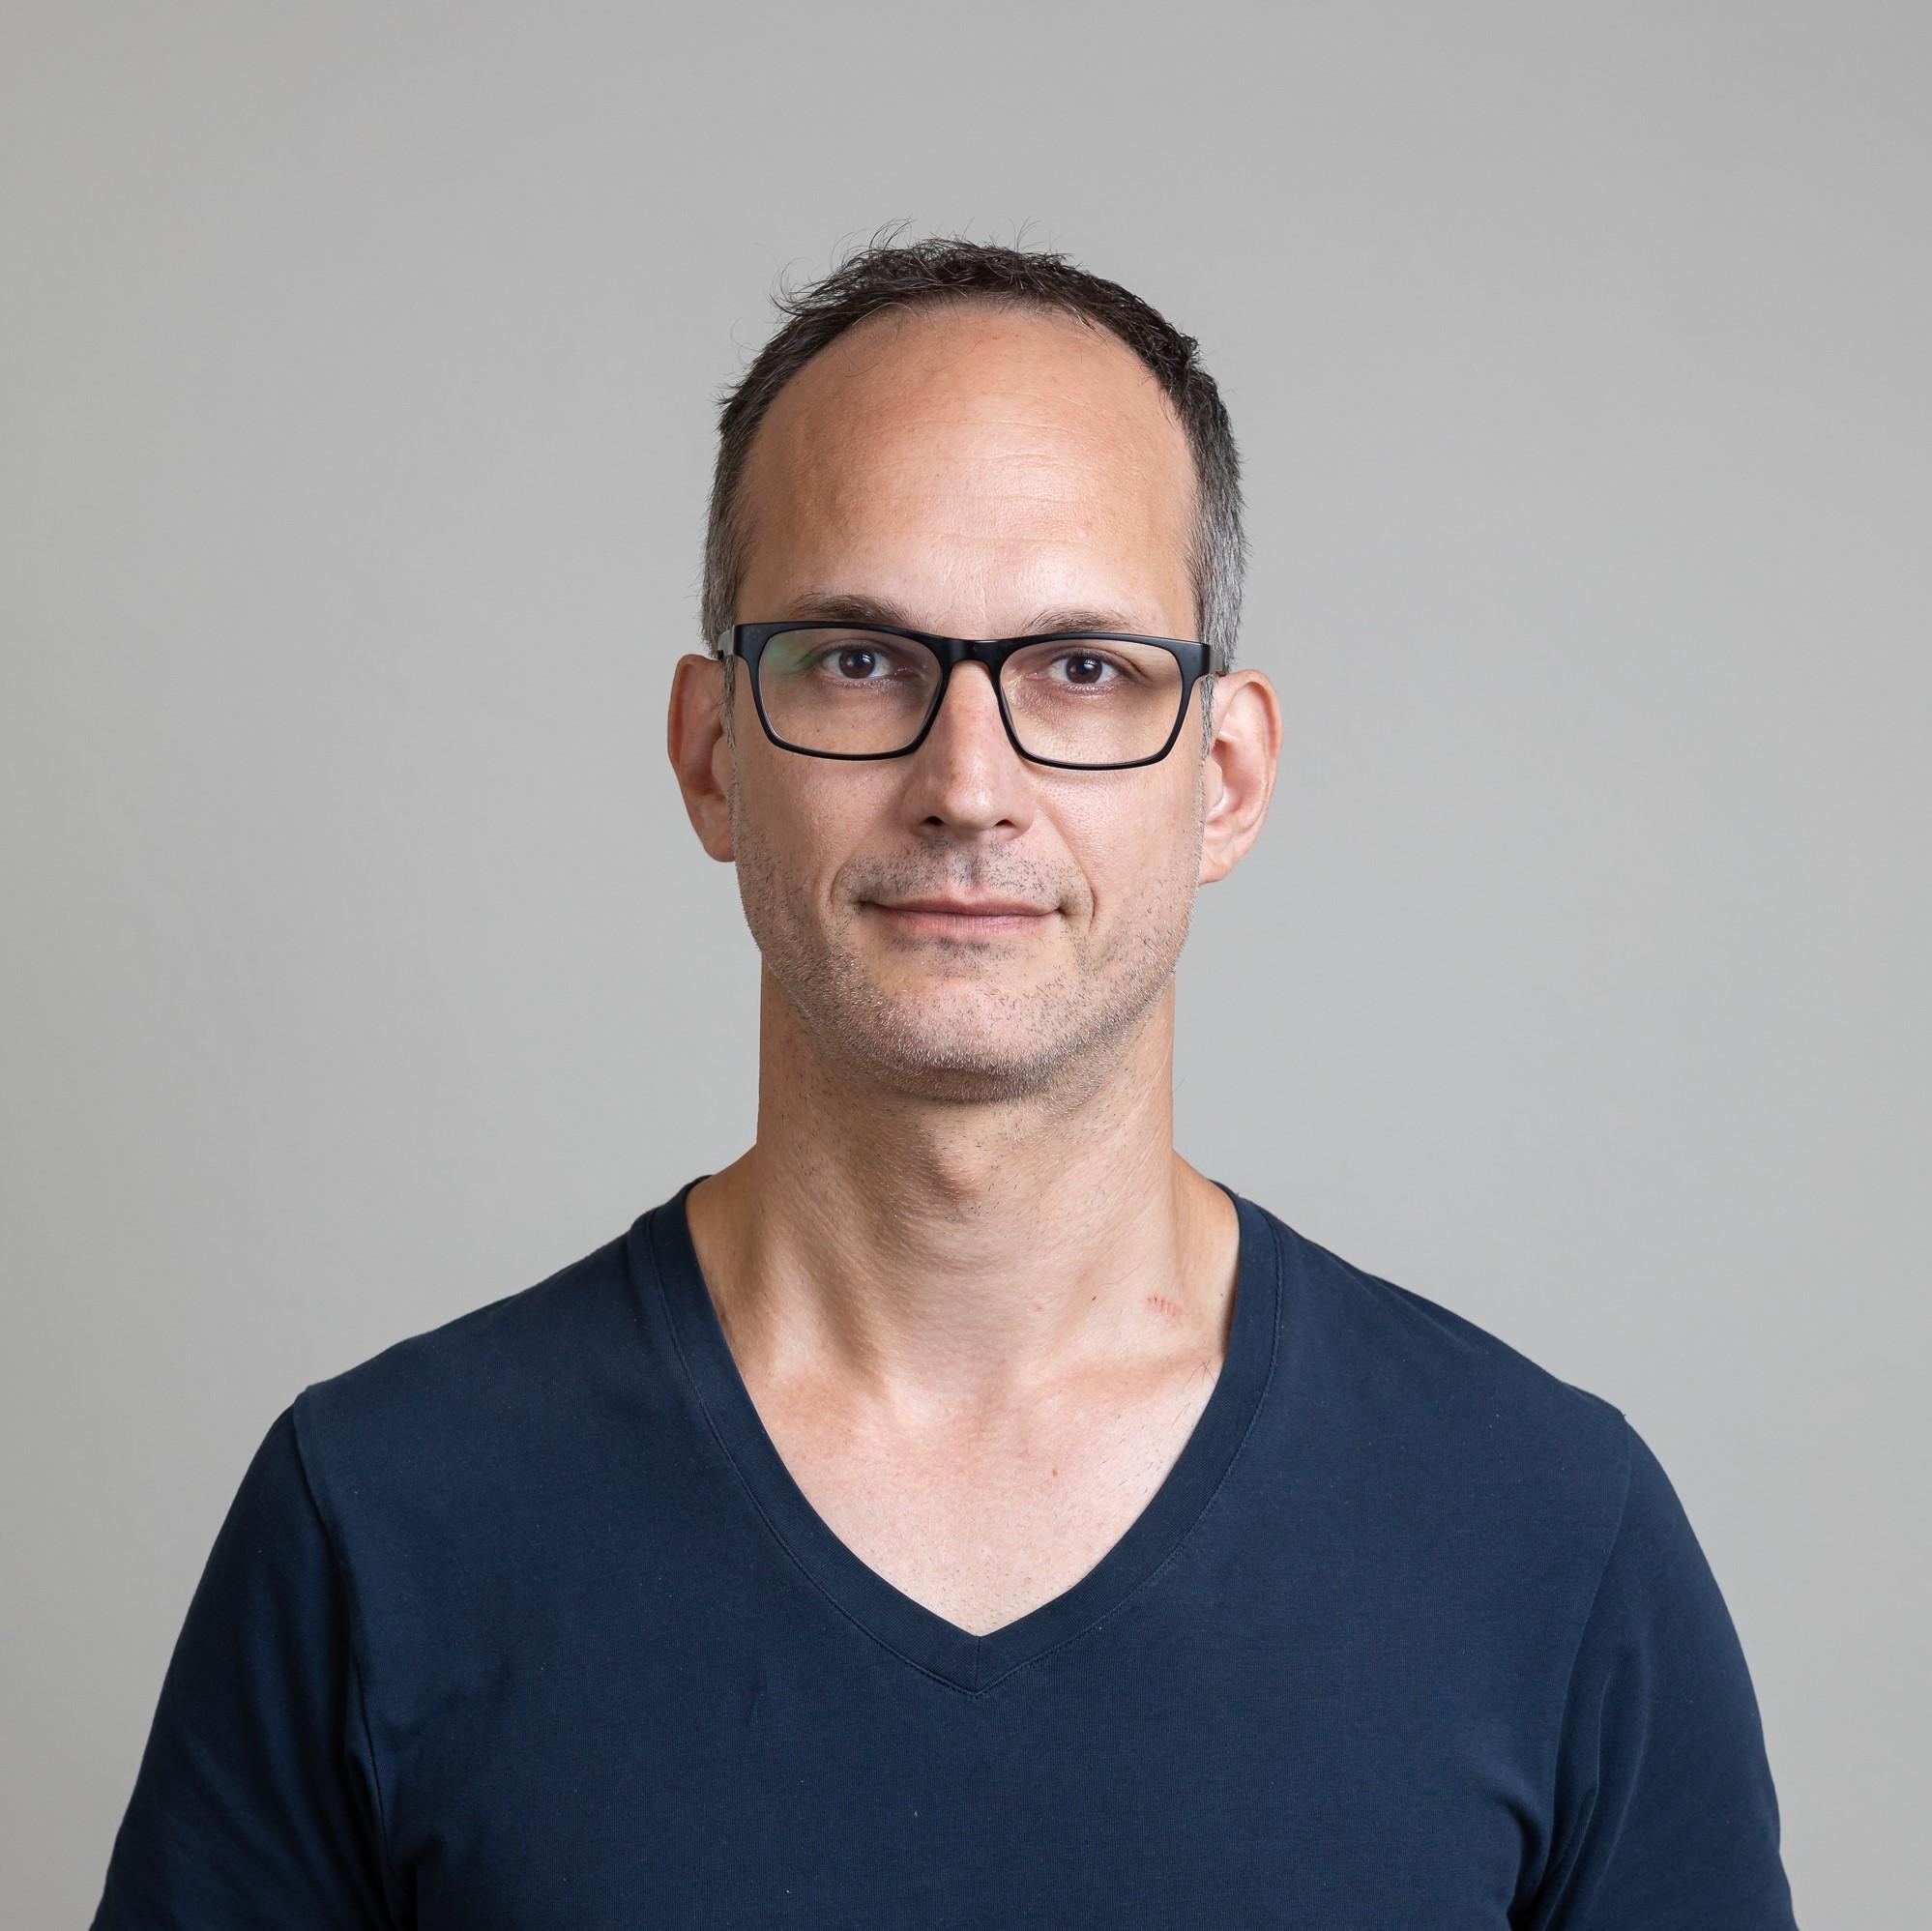 Stefan Kleinberger